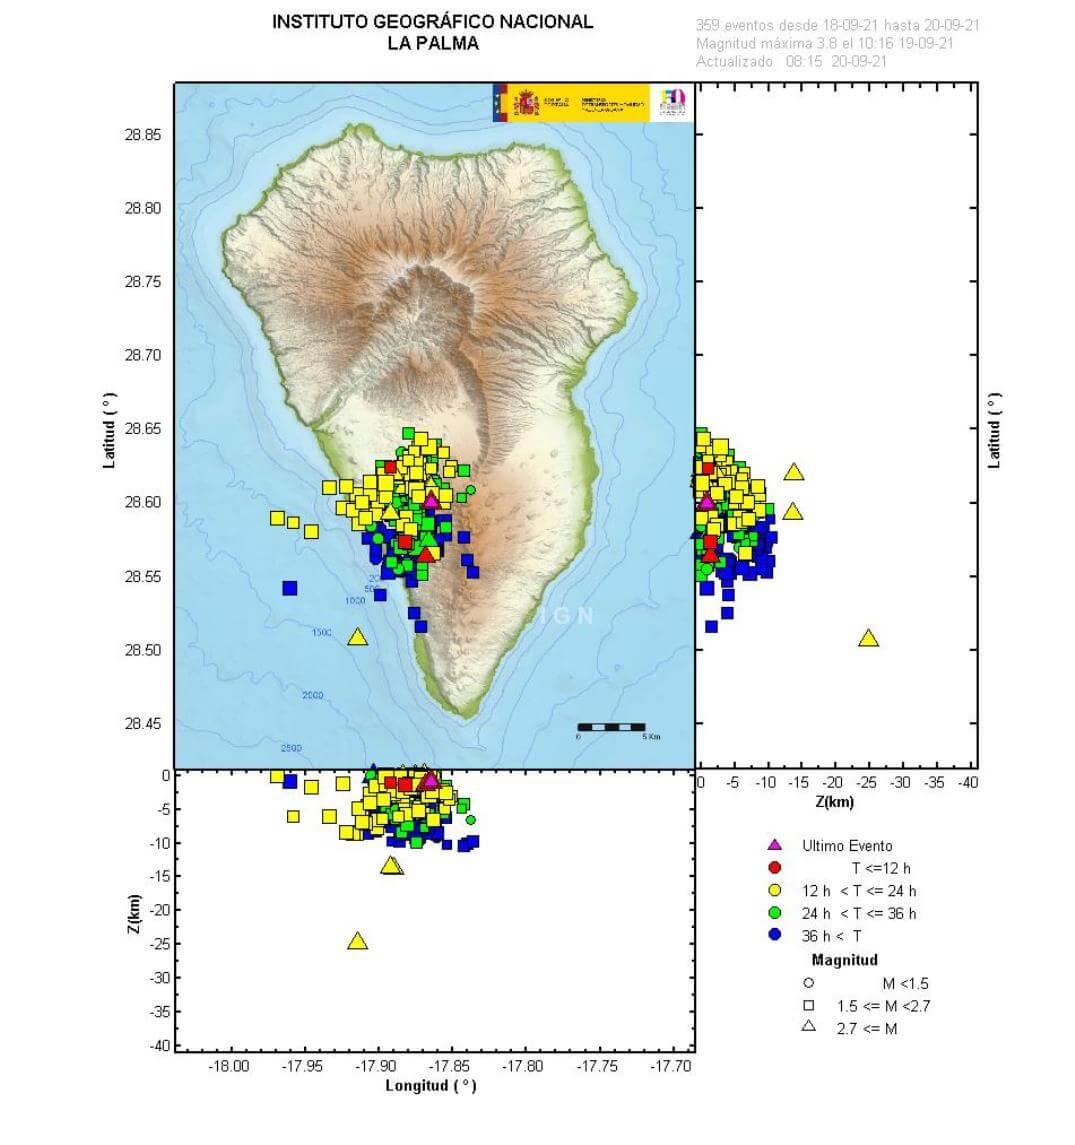 la-palma-cumbre-vieja-volcano-canary-islands-eruption-2021-earthquakes-analysis